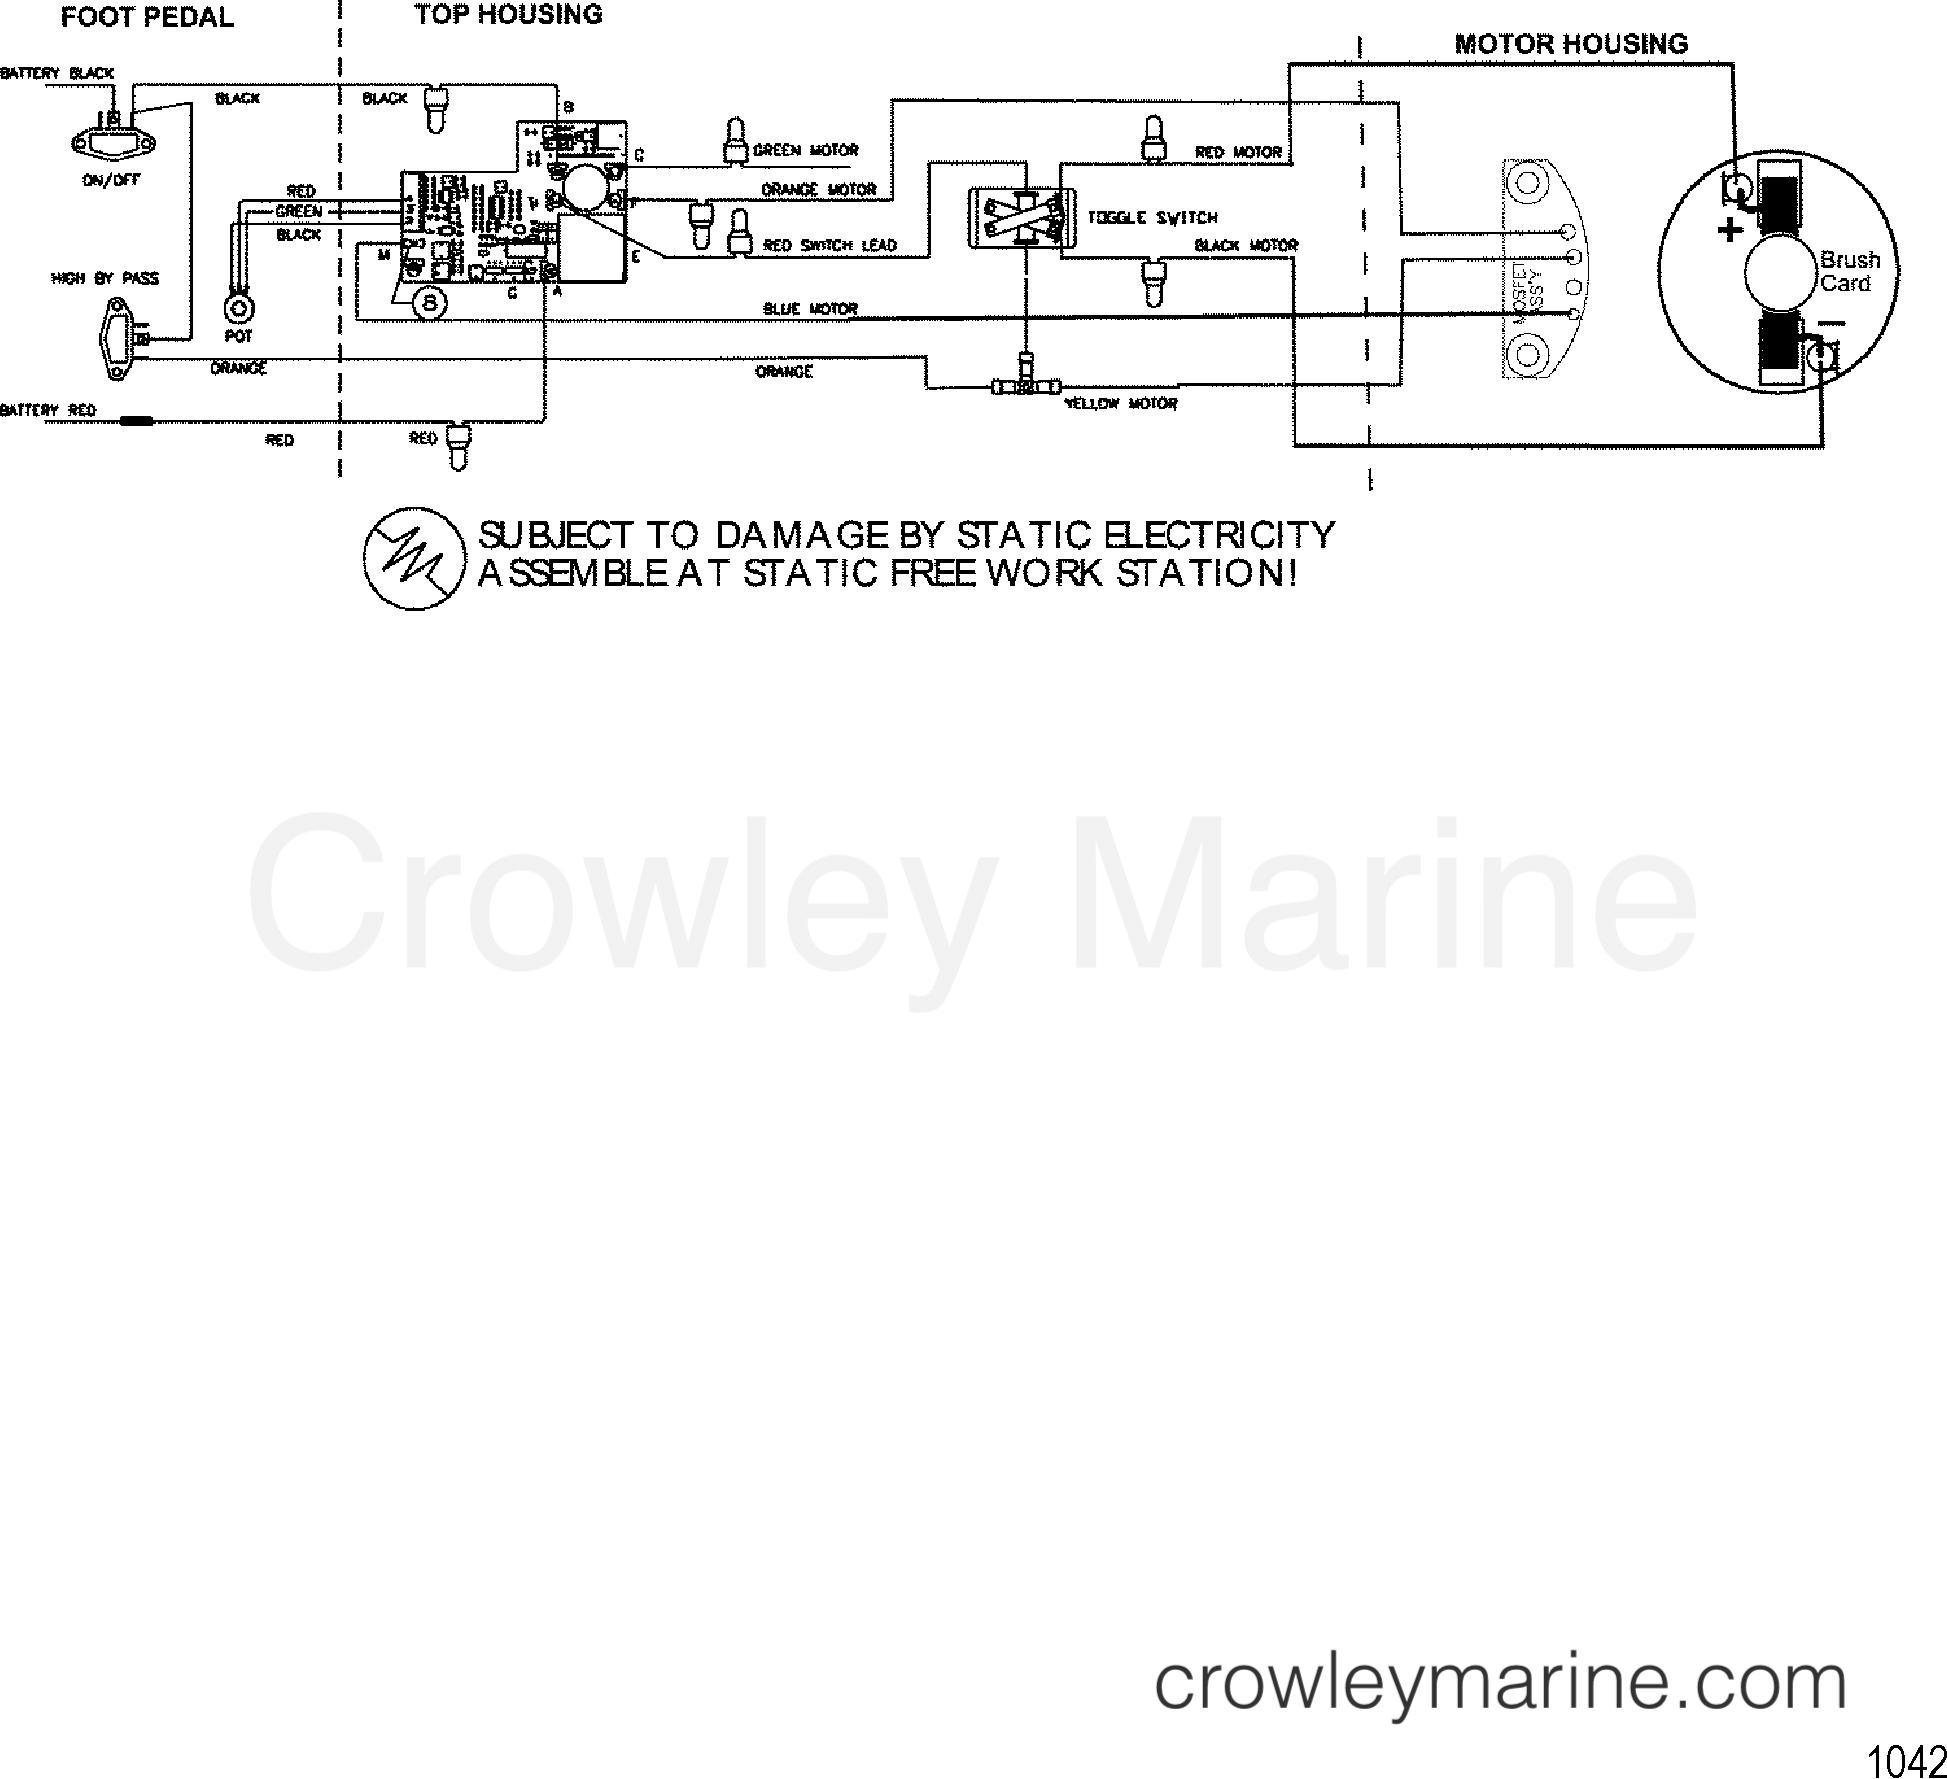 1999 motorguide 12/24v [motorguide] - 9667b49v1 - wire diagram(model 660v